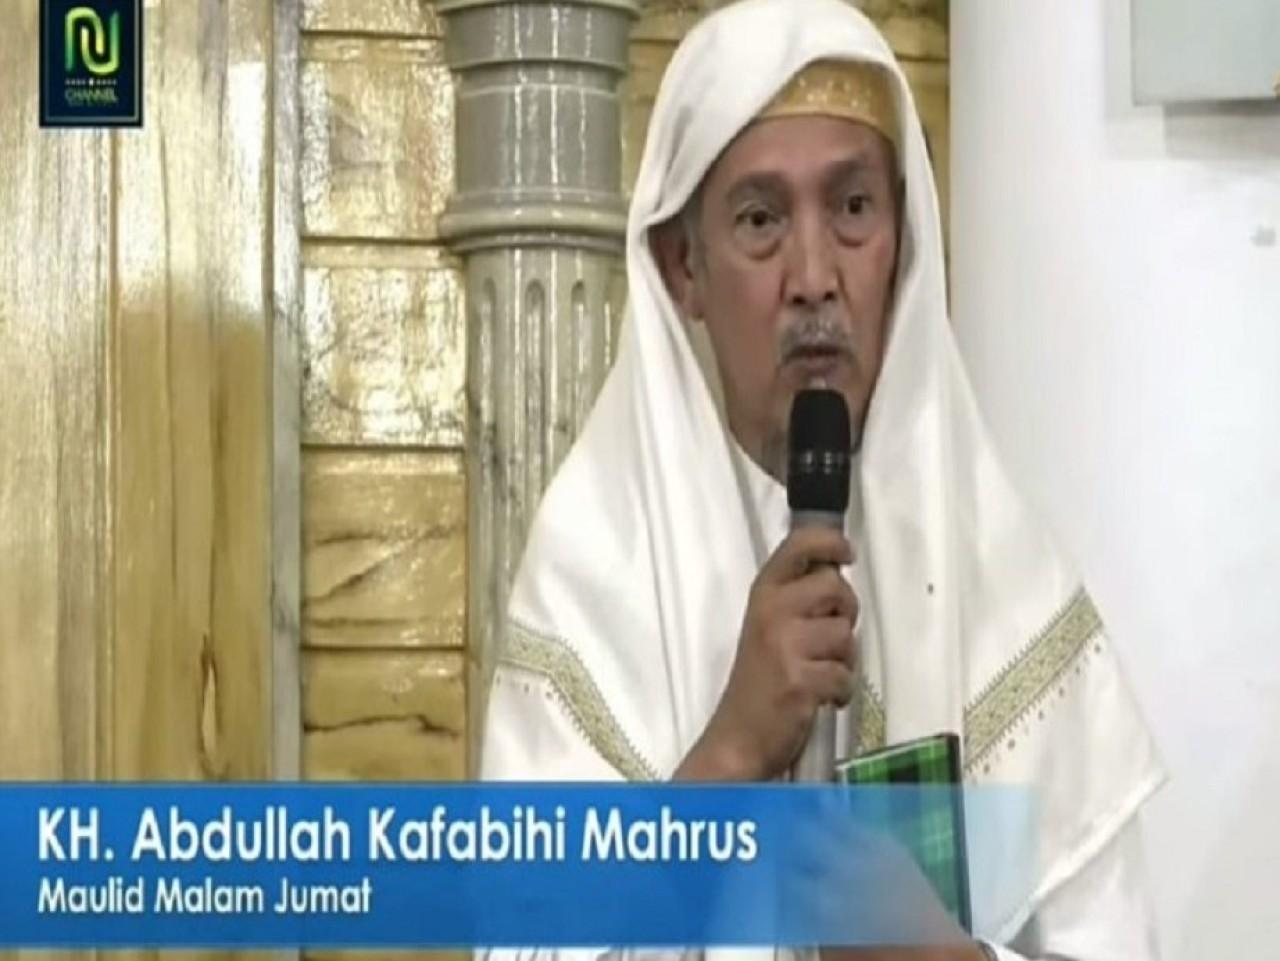 Kiai Kafabihi calls on Muslims to be grateful for being Prophet's ummah